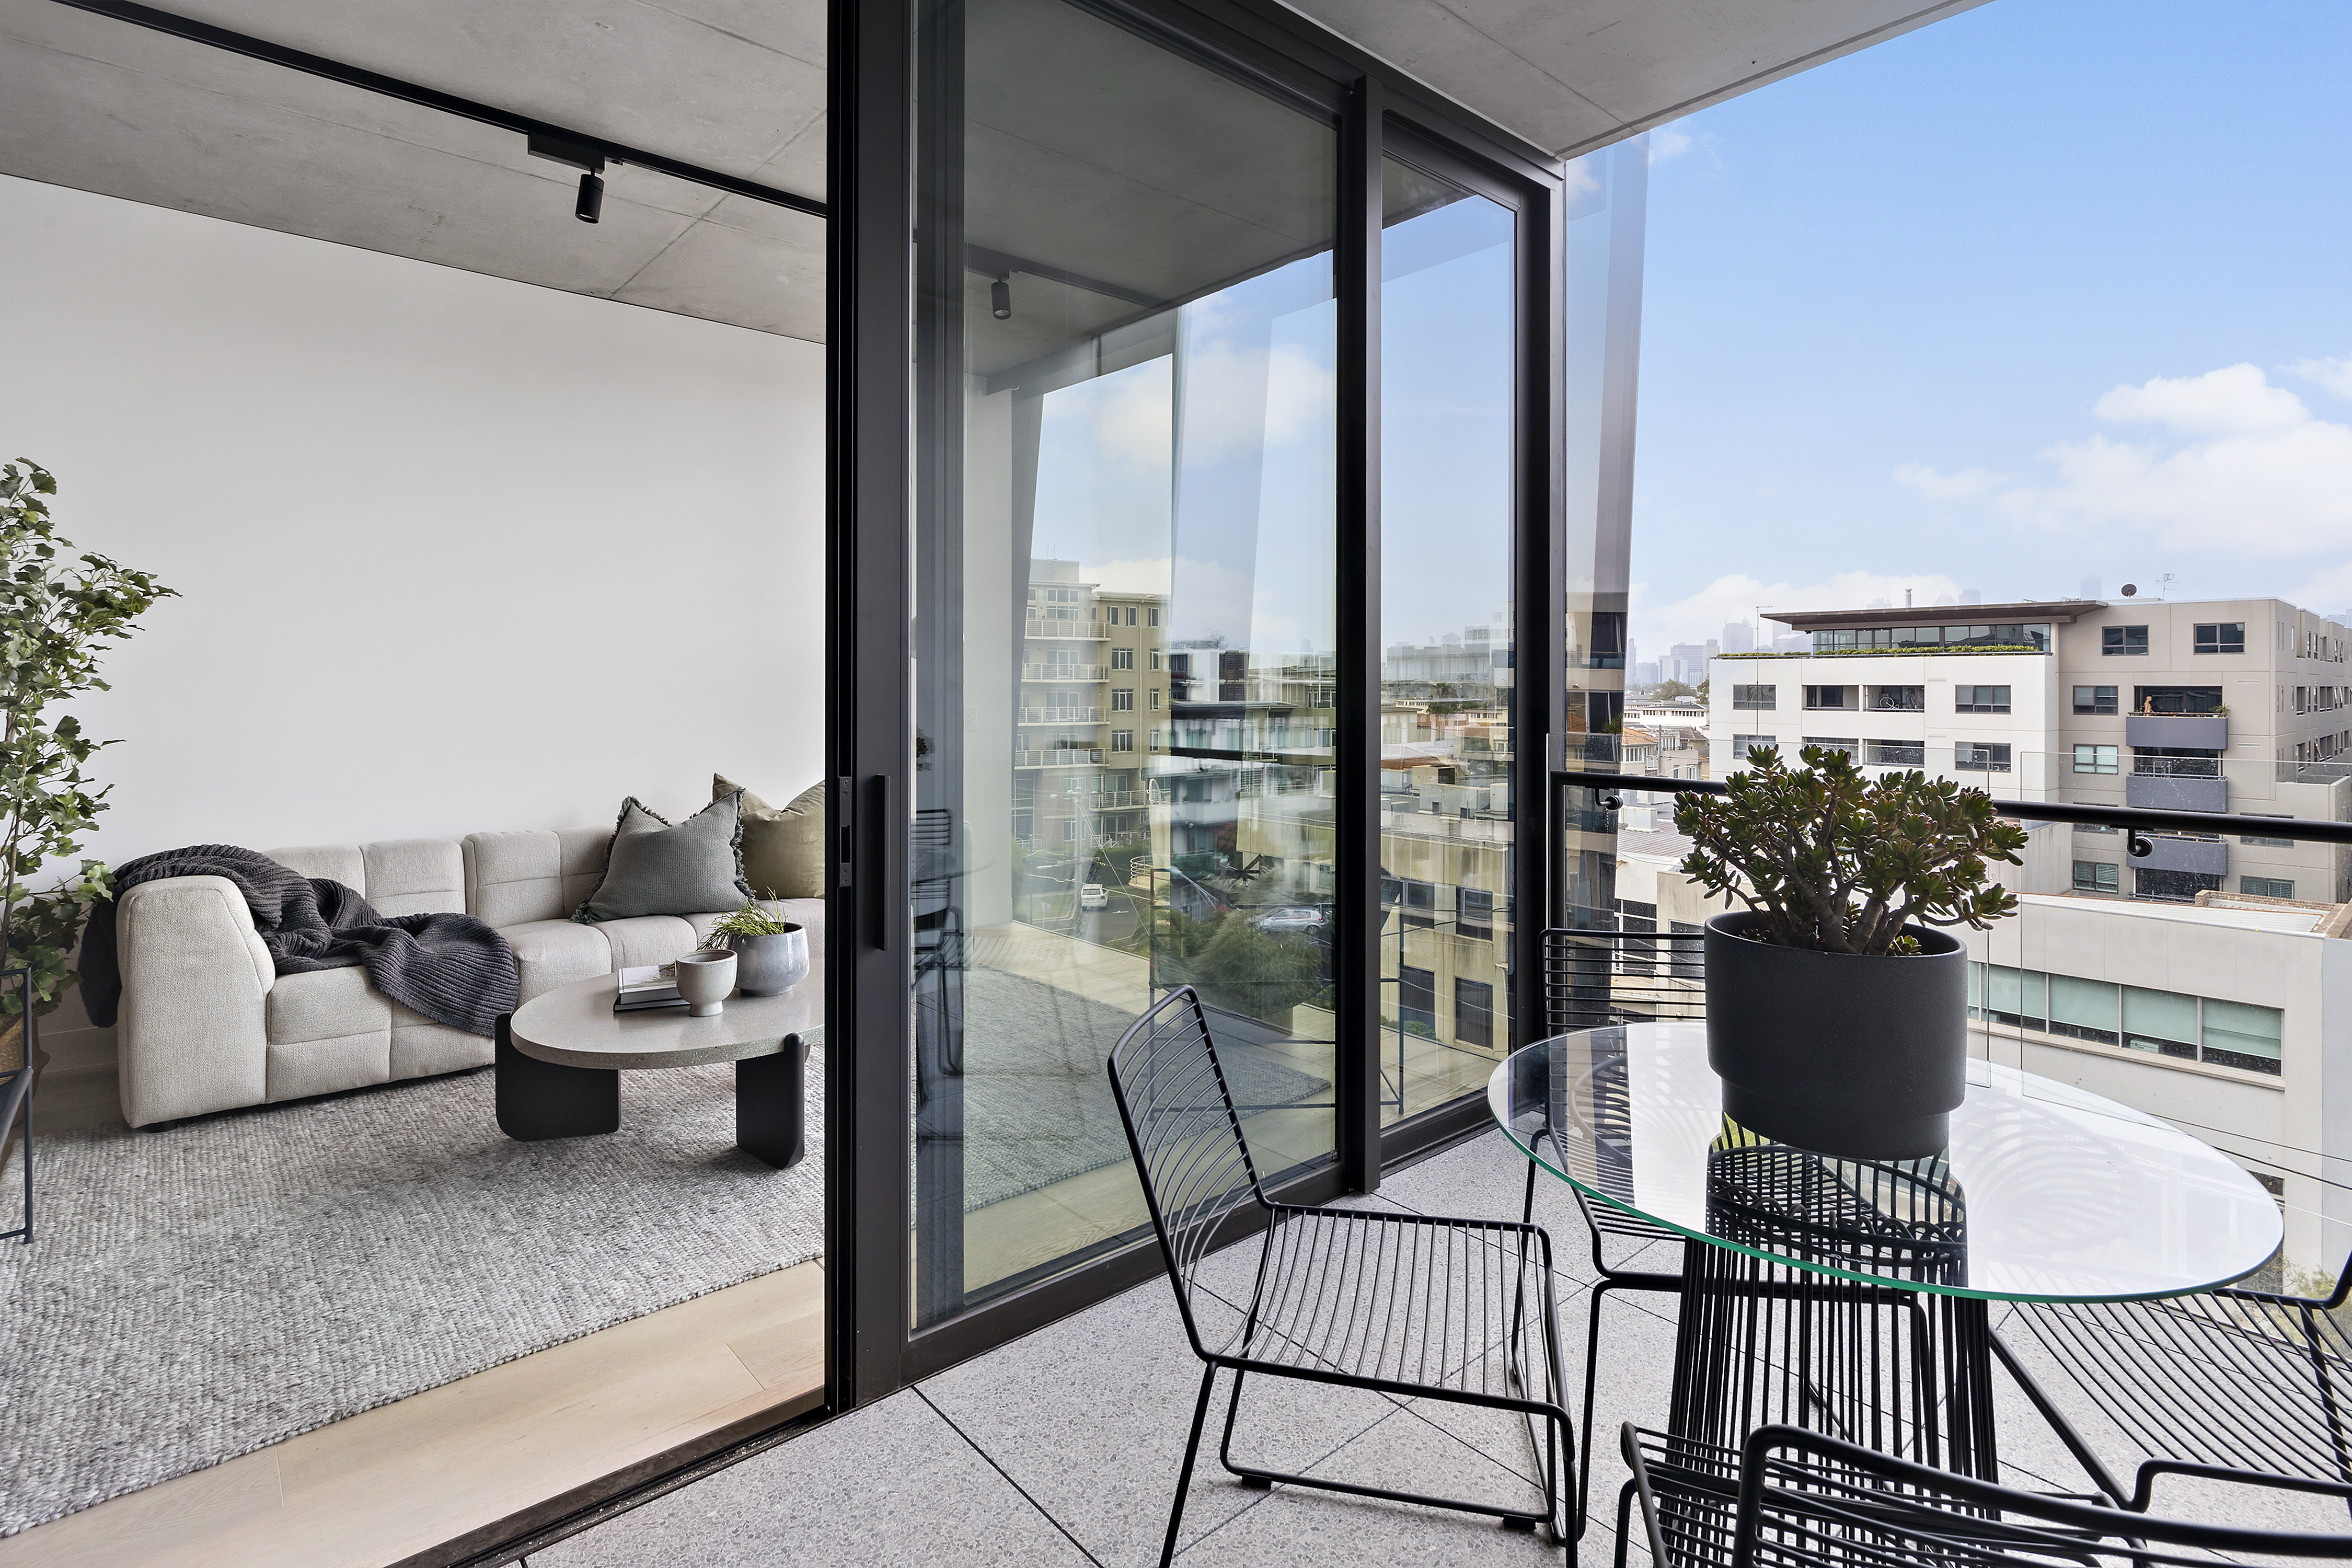 405-9-johnston-street-port-melbourne-student-accommodation-Melbourne-Balcony-Unilodgers